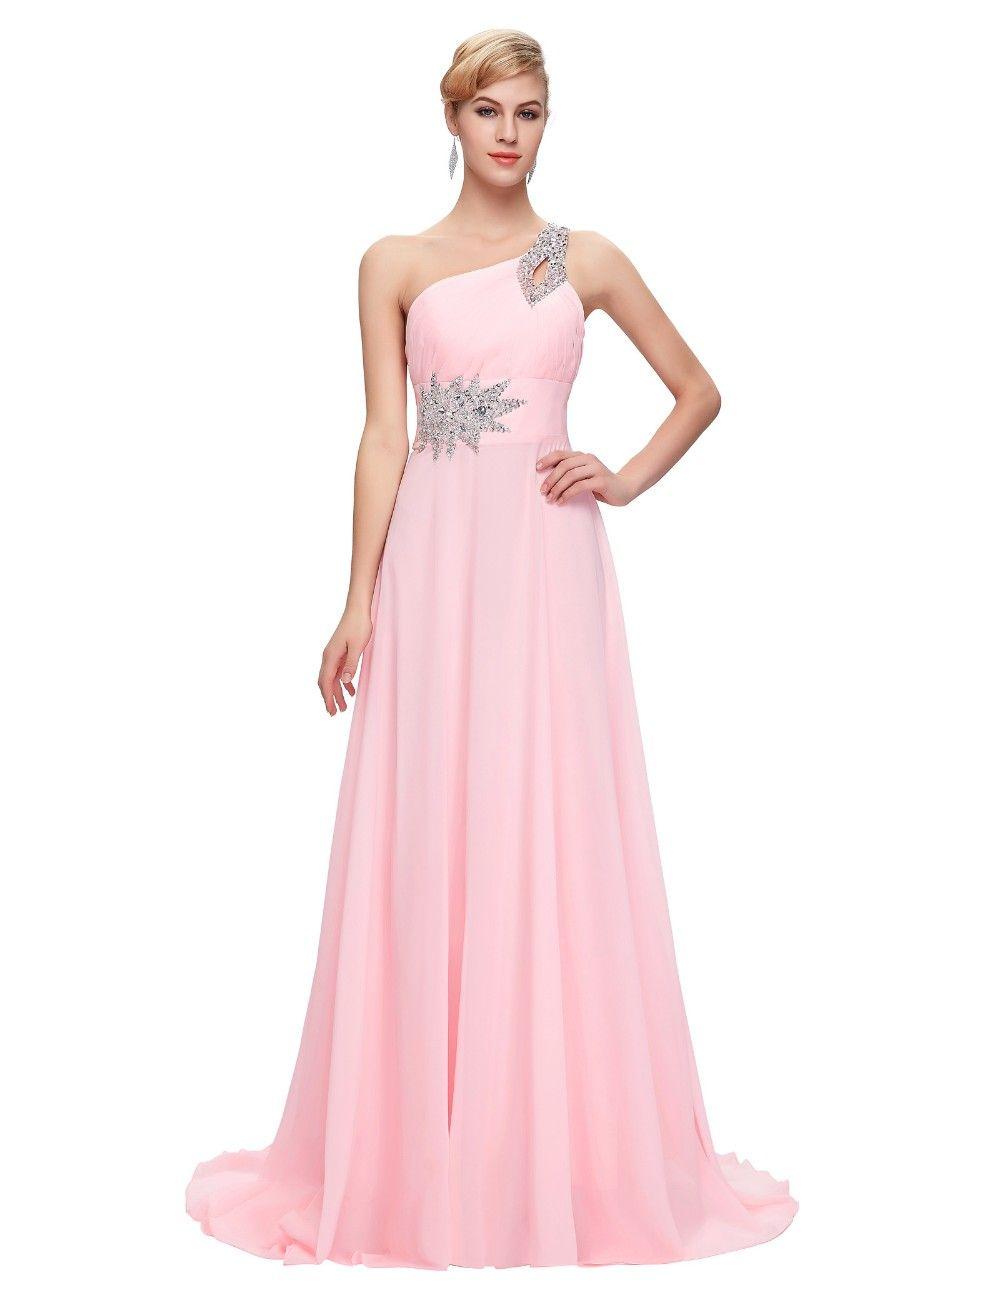 Compre Vestidos De Dama De Honor Largos De Gasa Un Hombro Rebordear Azul Royal Púrpura Rojo Rosa Vestido De Dama De Honor Vestido Barato A $45.23 Del ...